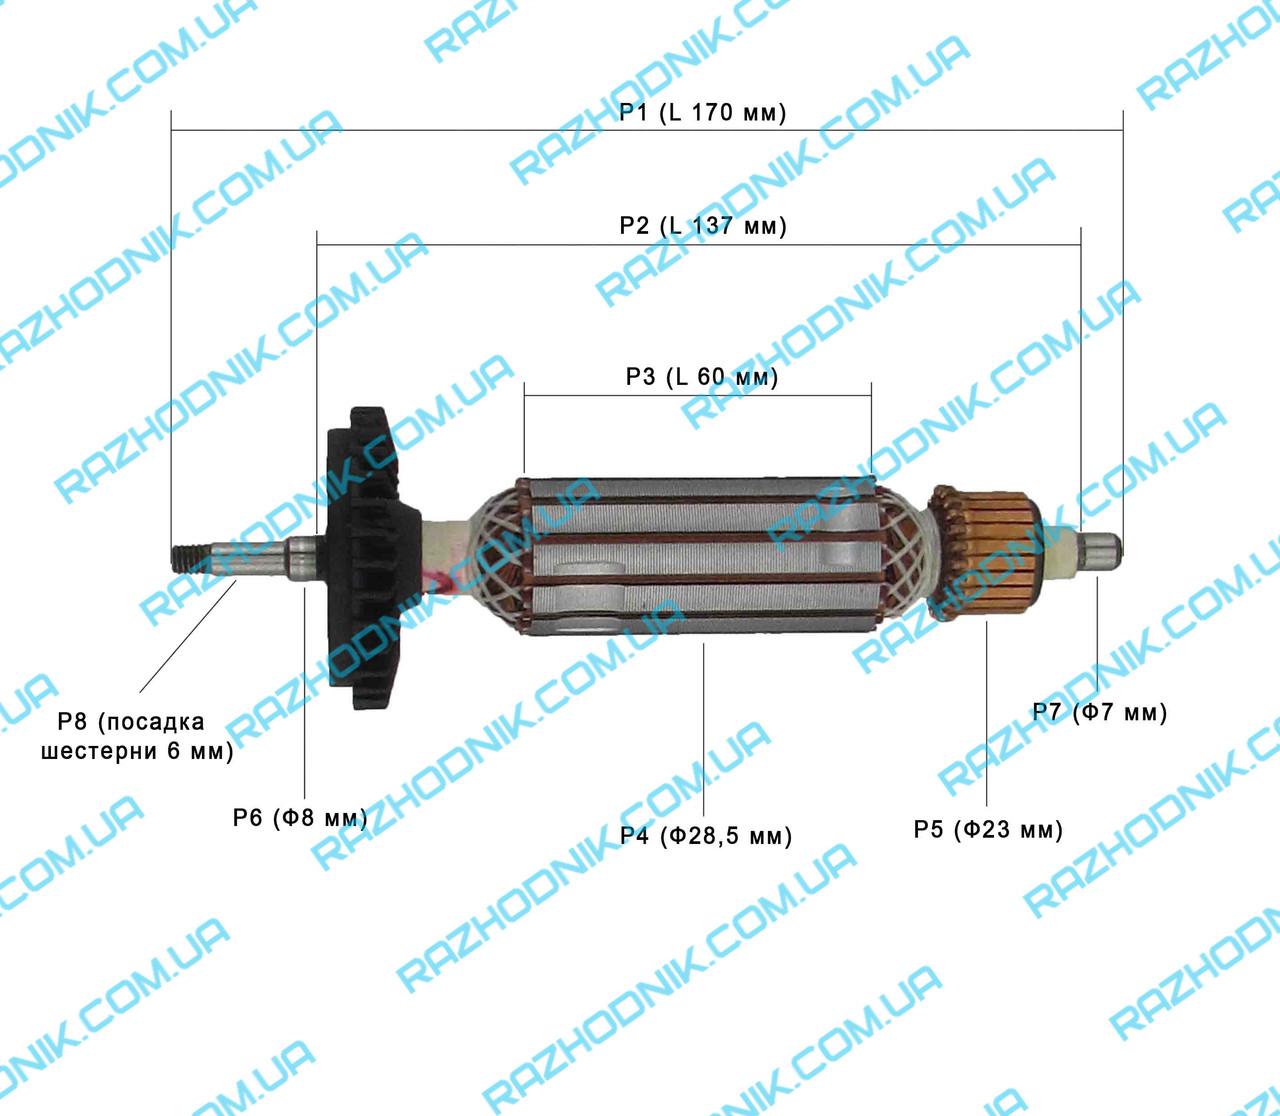 Якір на болгарку Bosch GWS 7-100 (Аналог)